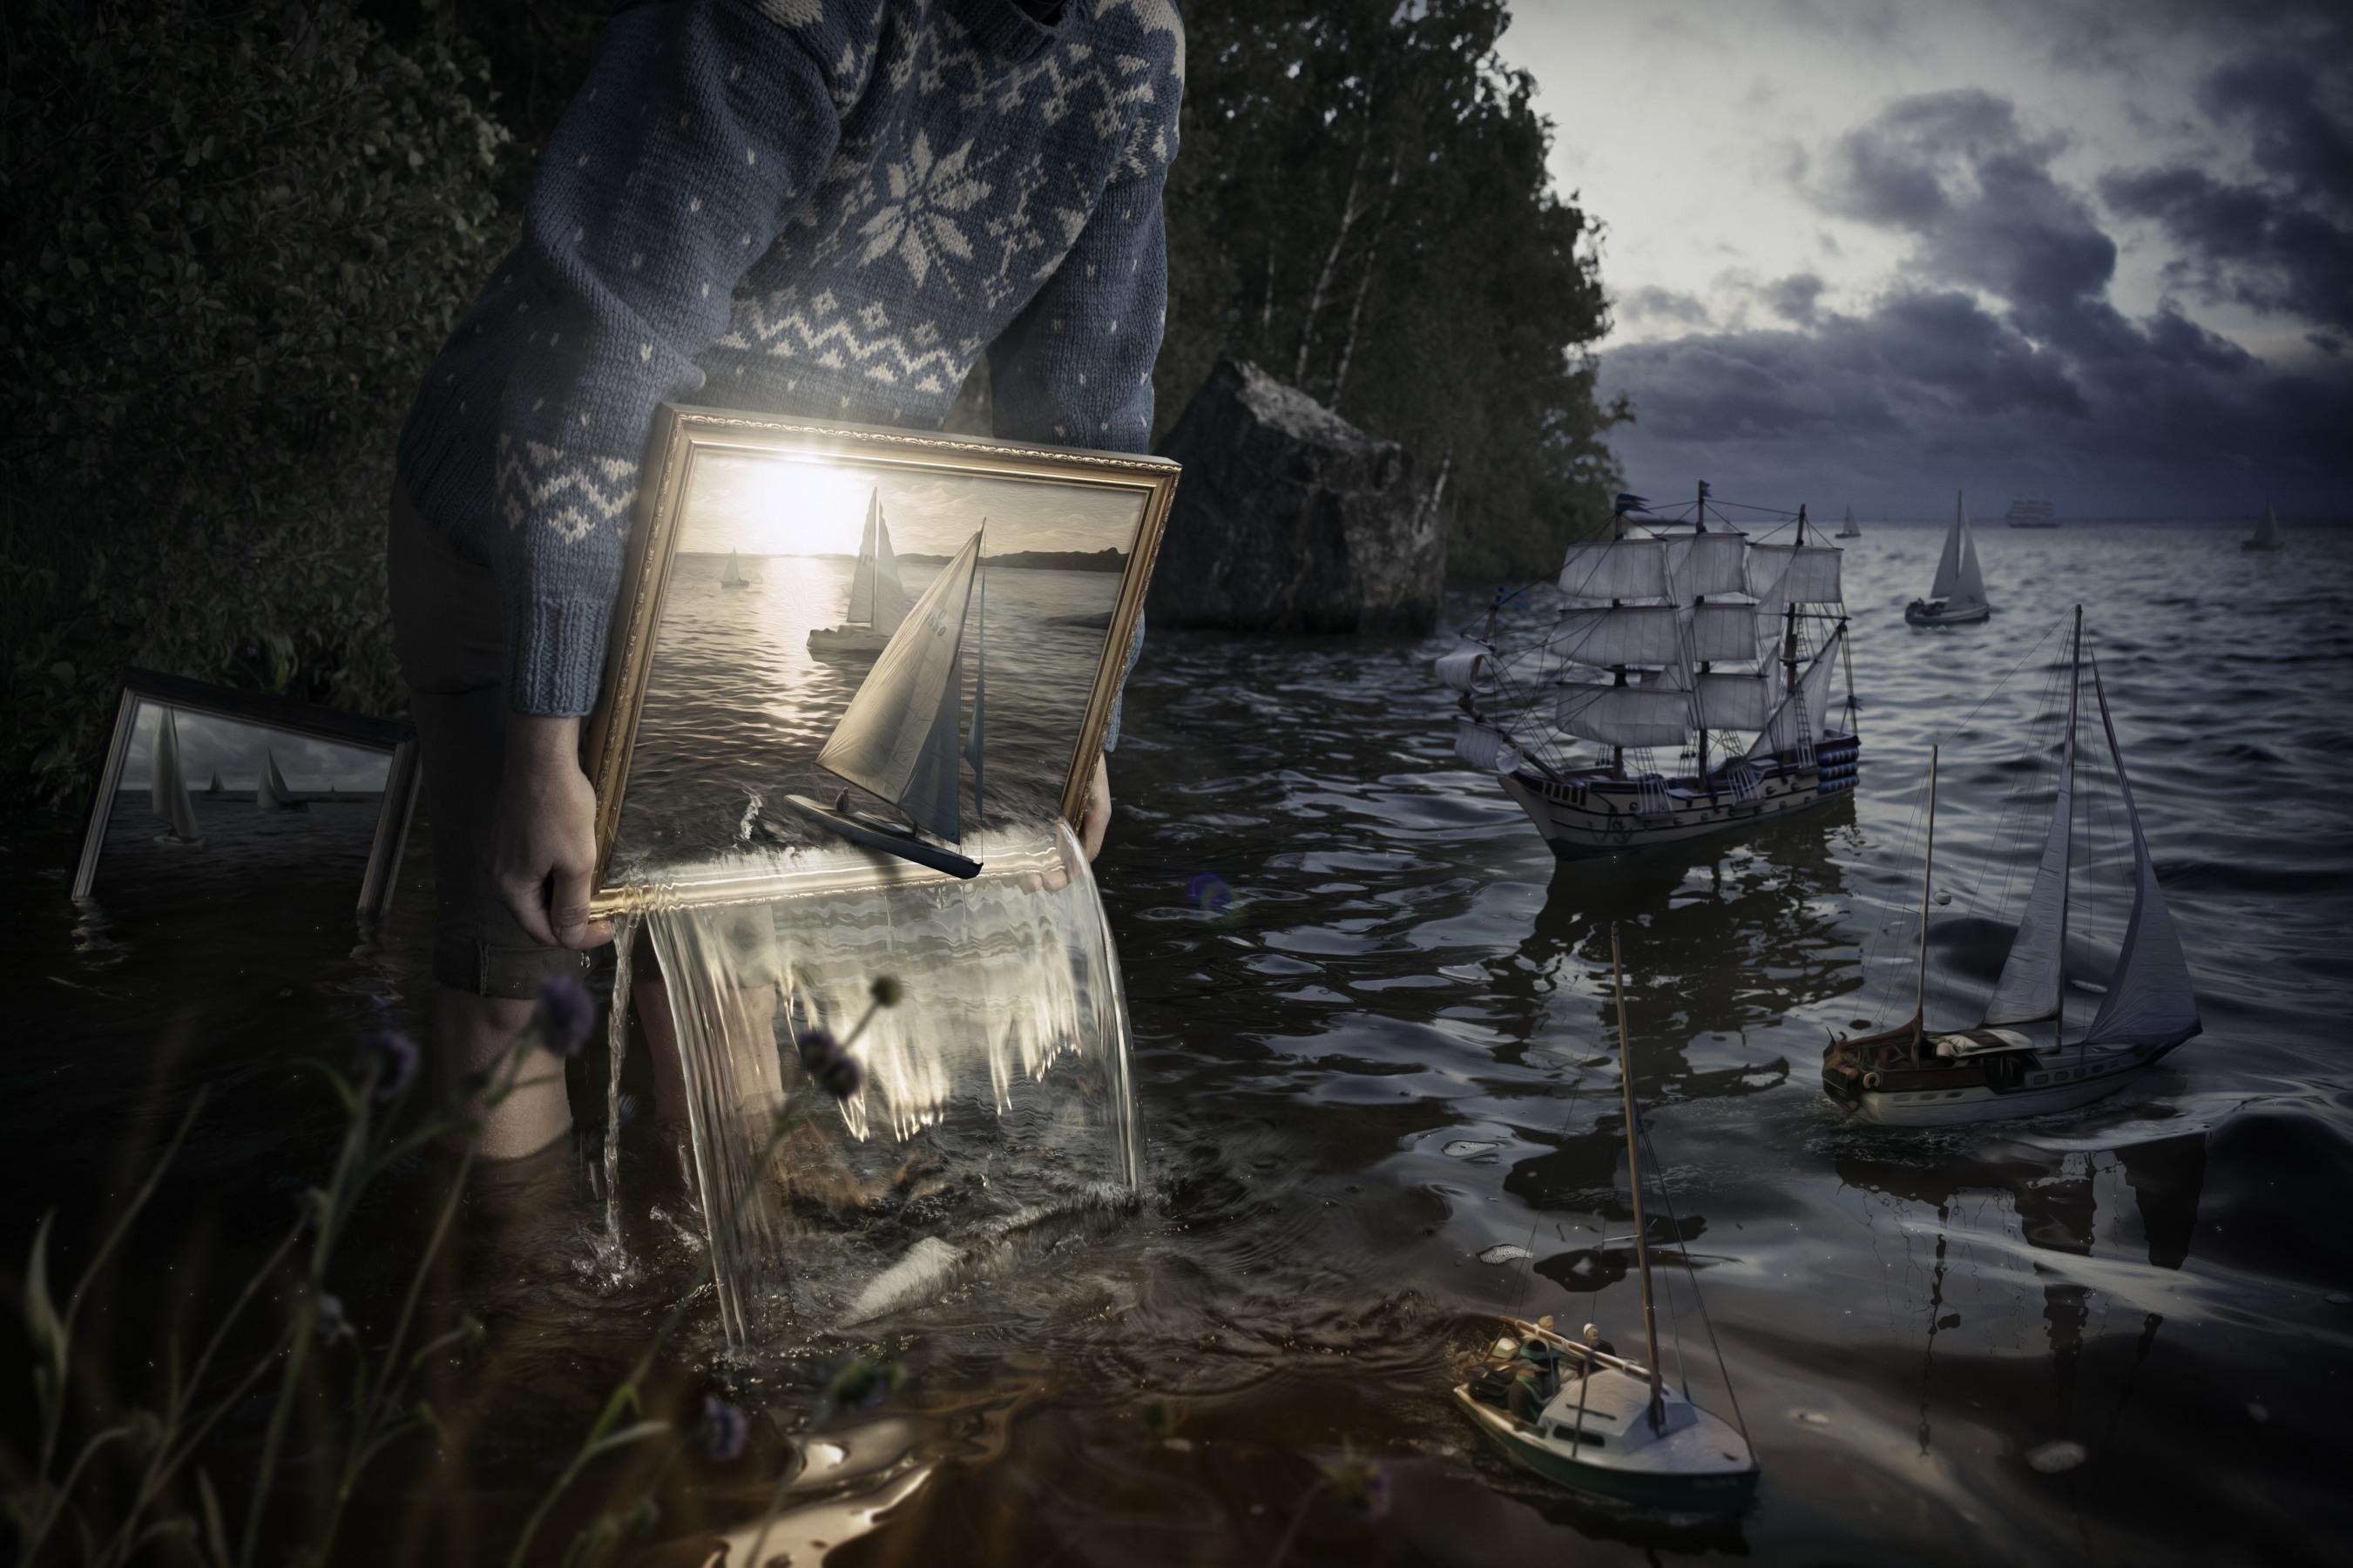 корабль, картина, зеркало